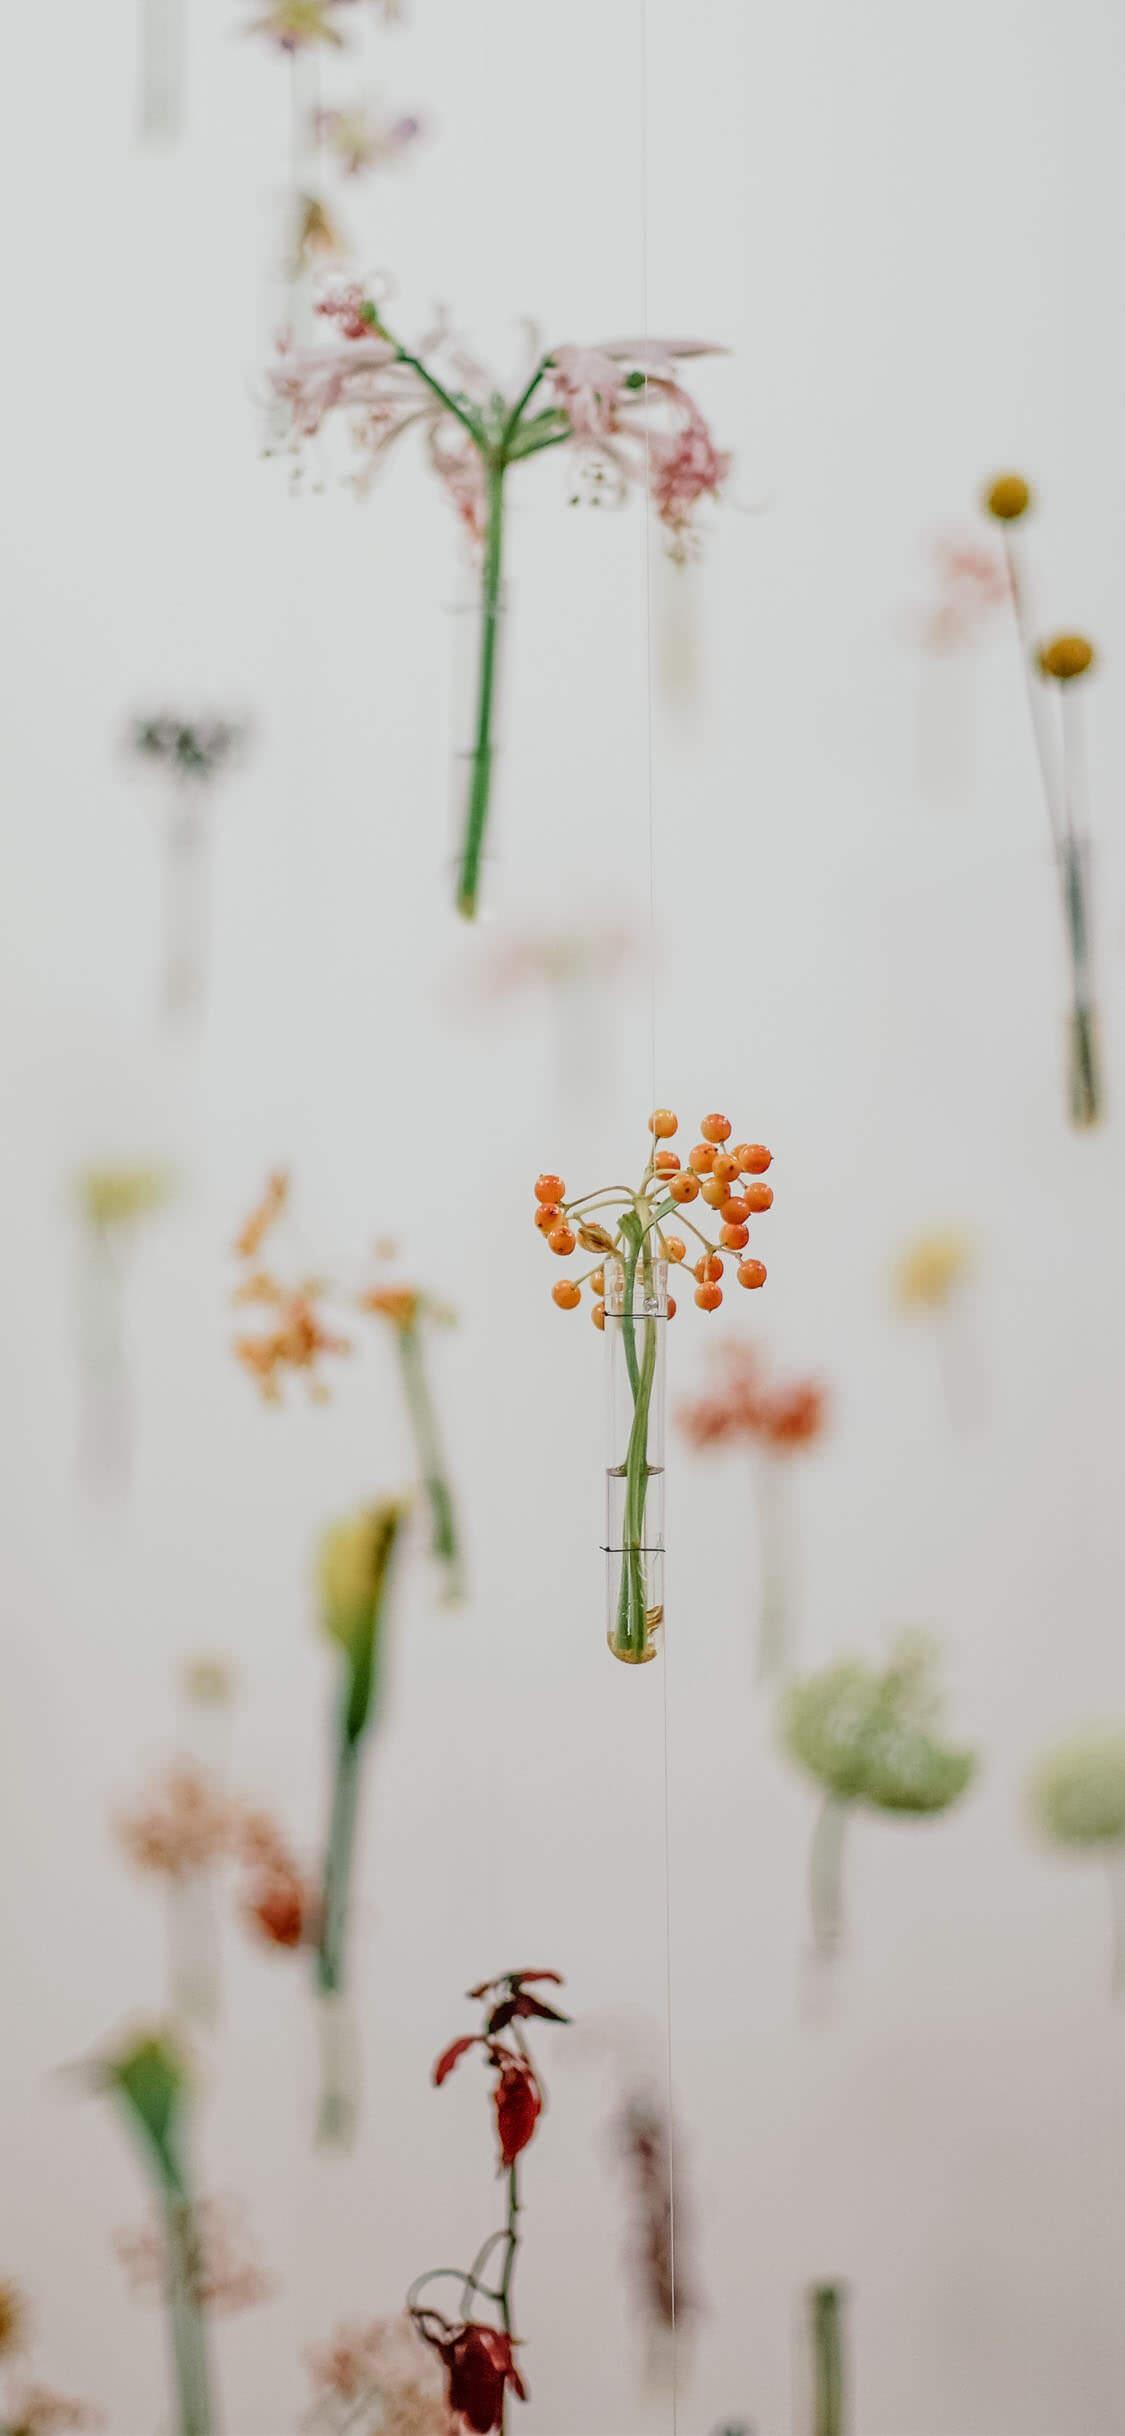 Succulent Iphone Xs Wallpapers Wallpaper Cave